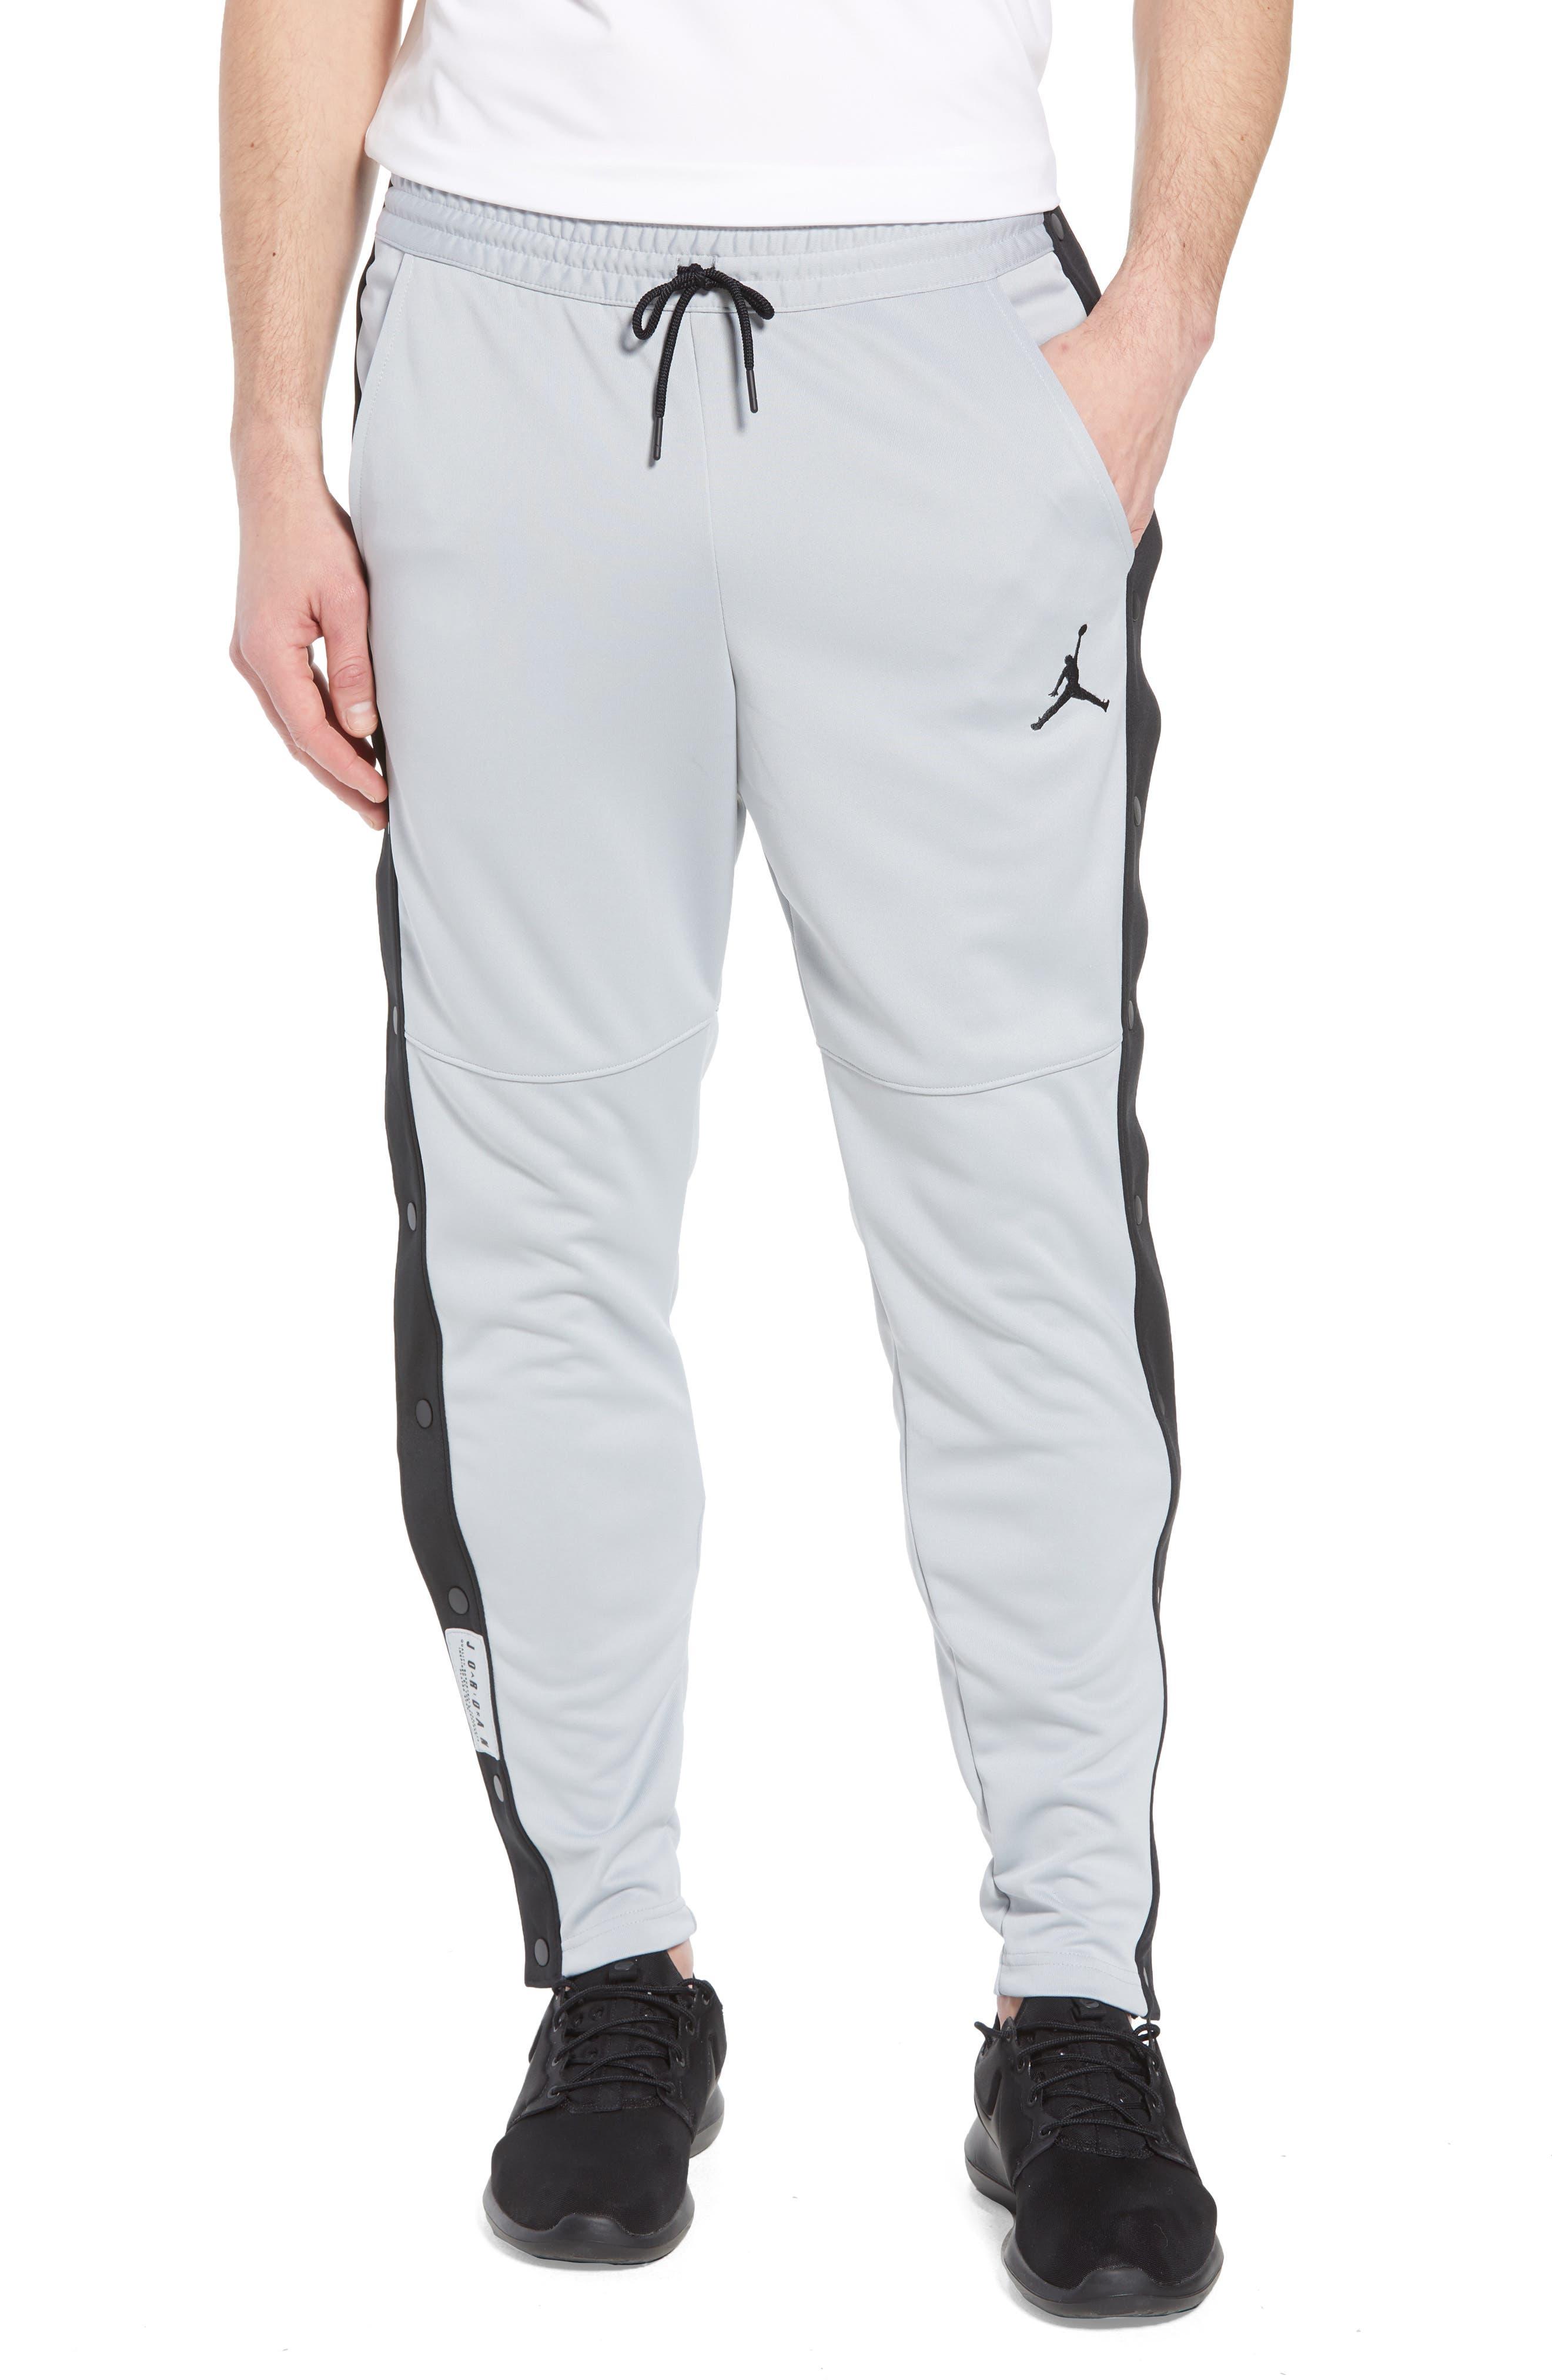 Alternate Image 1 Selected - Nike Jordan Rise Tear-Away Jogger Pants